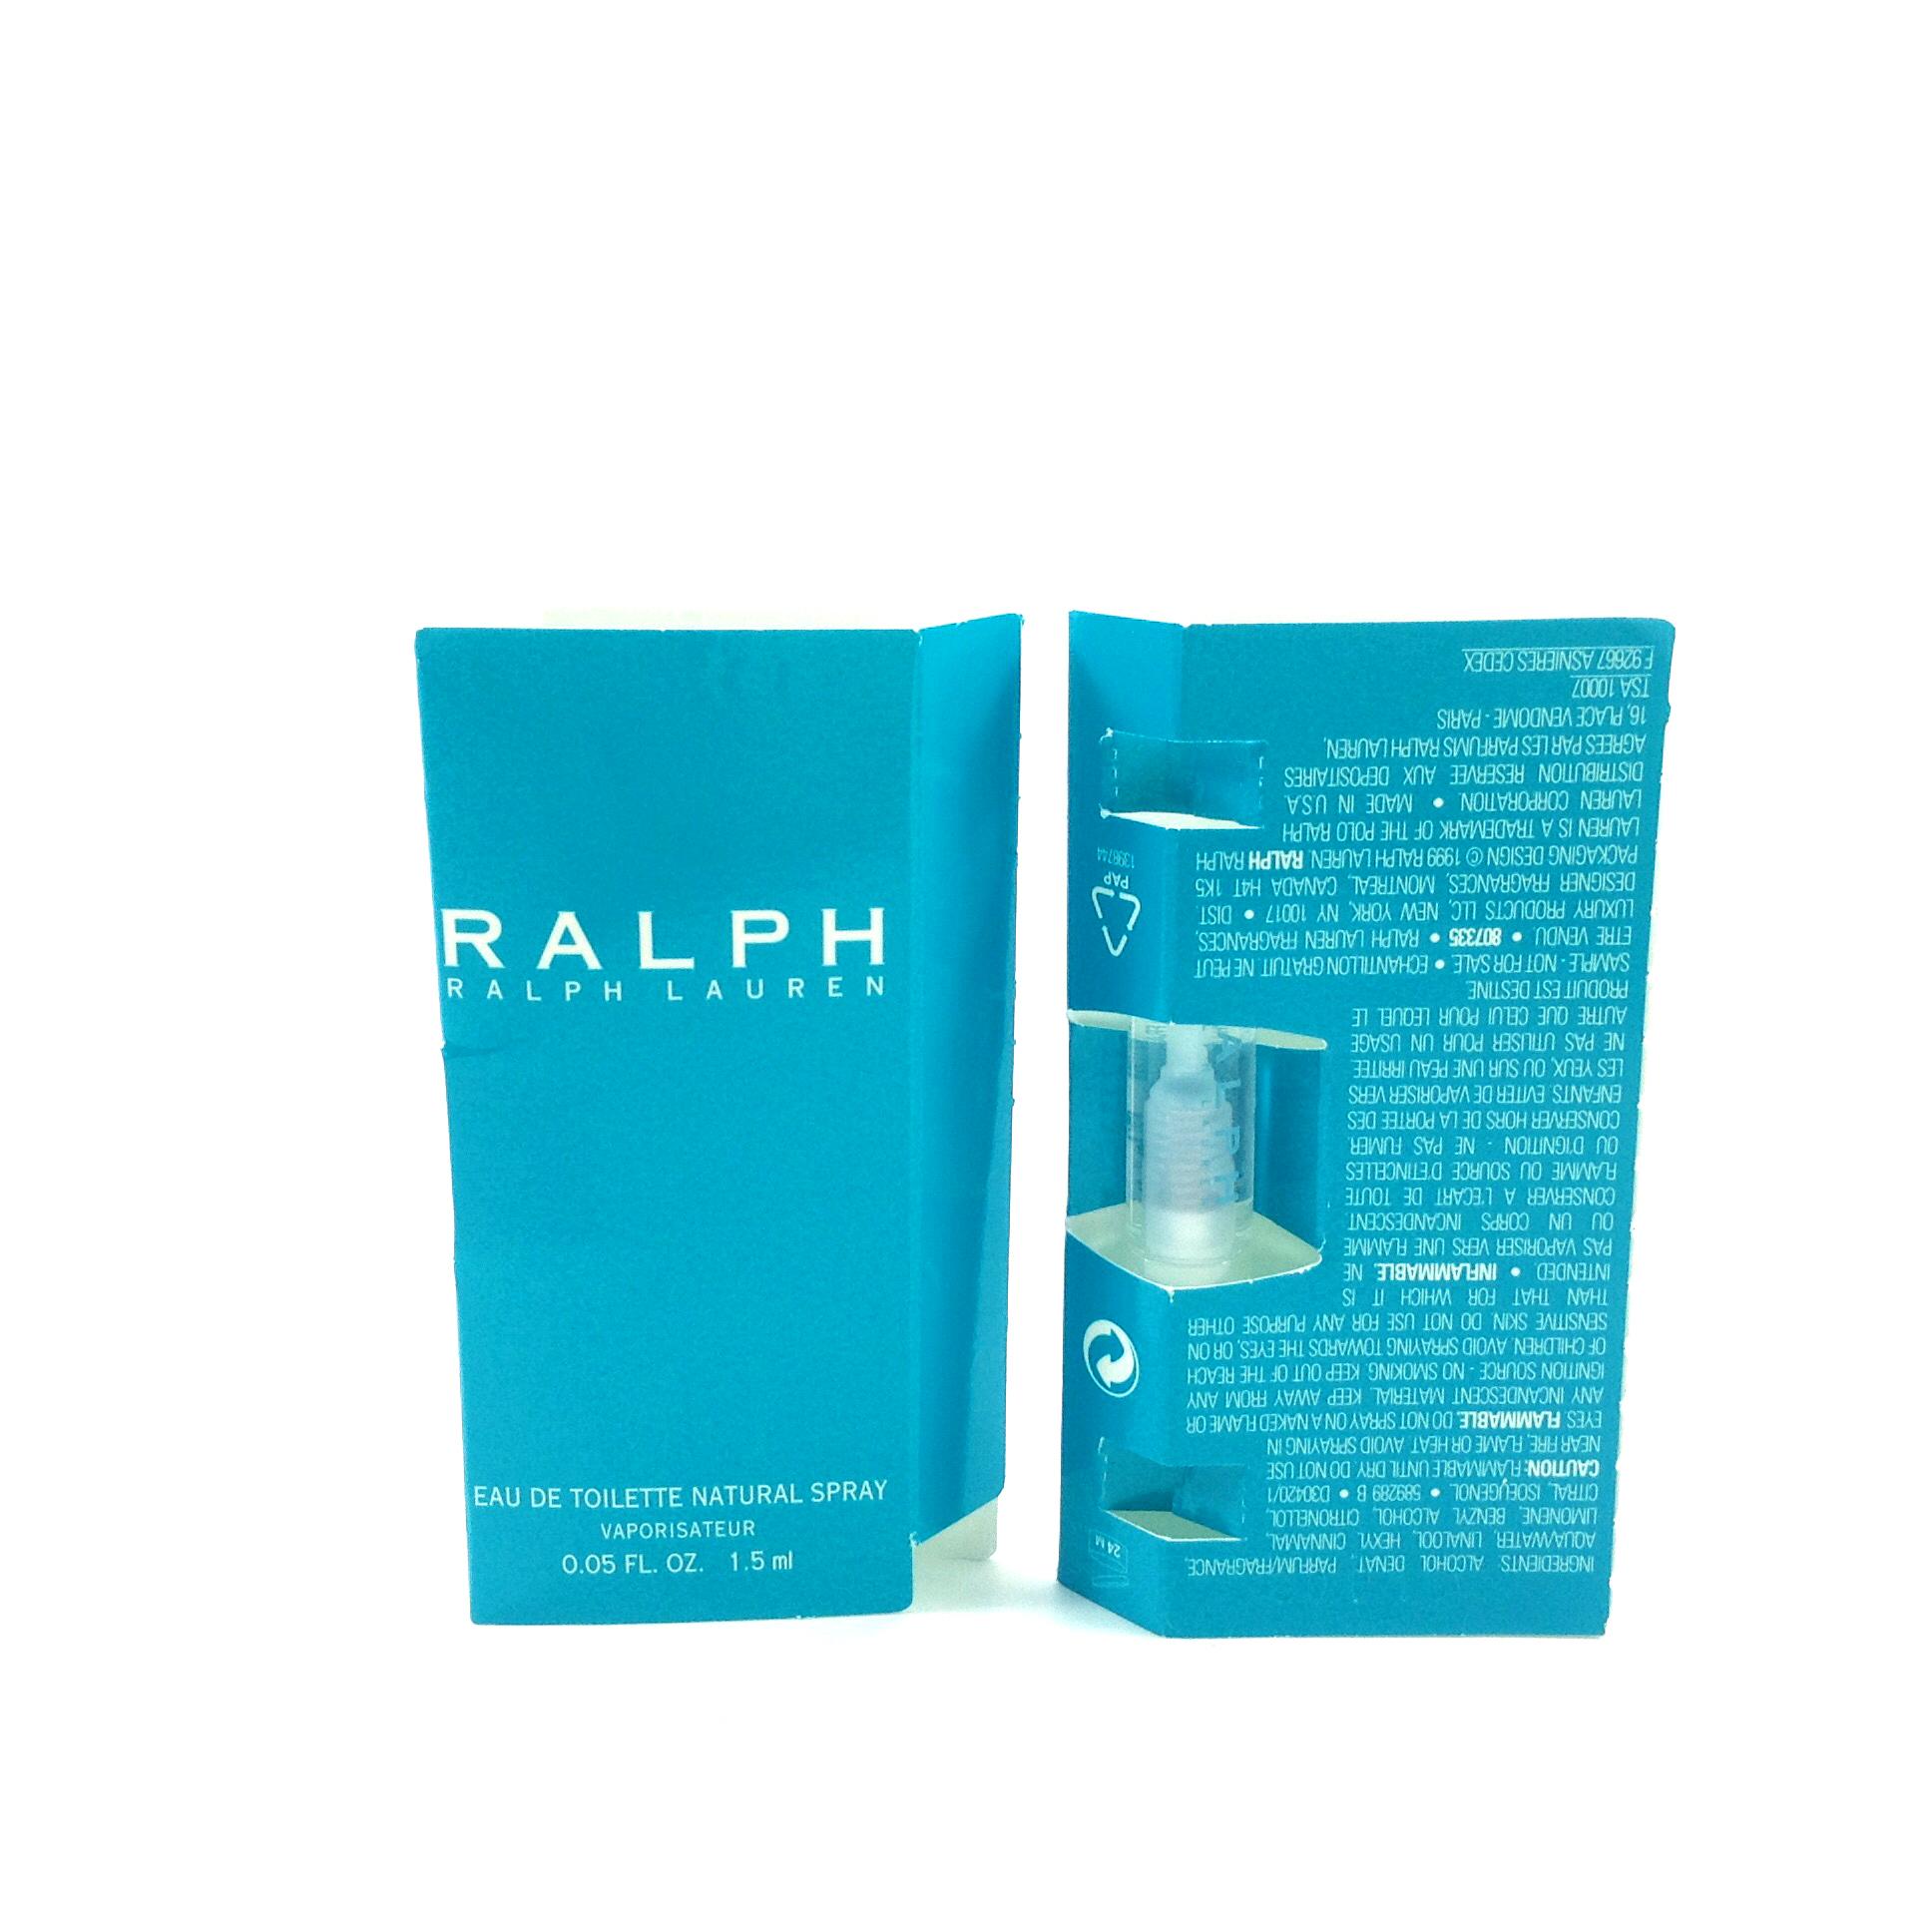 Ralph Ralph Lauren for women ขนาดทดลอง 1.5ml